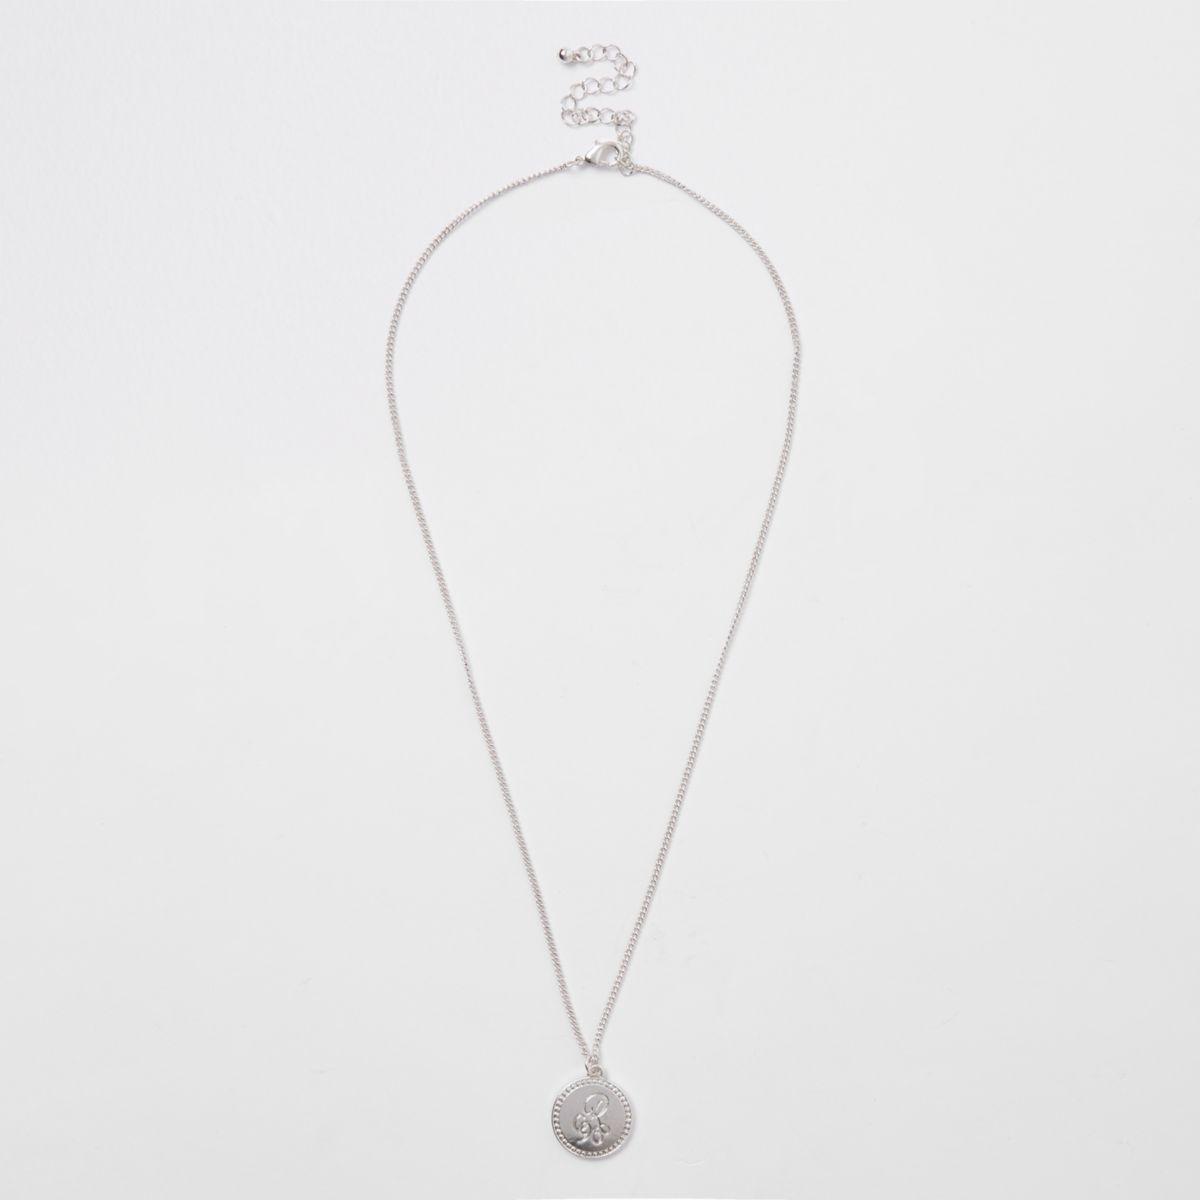 Silver tone RI coin necklace